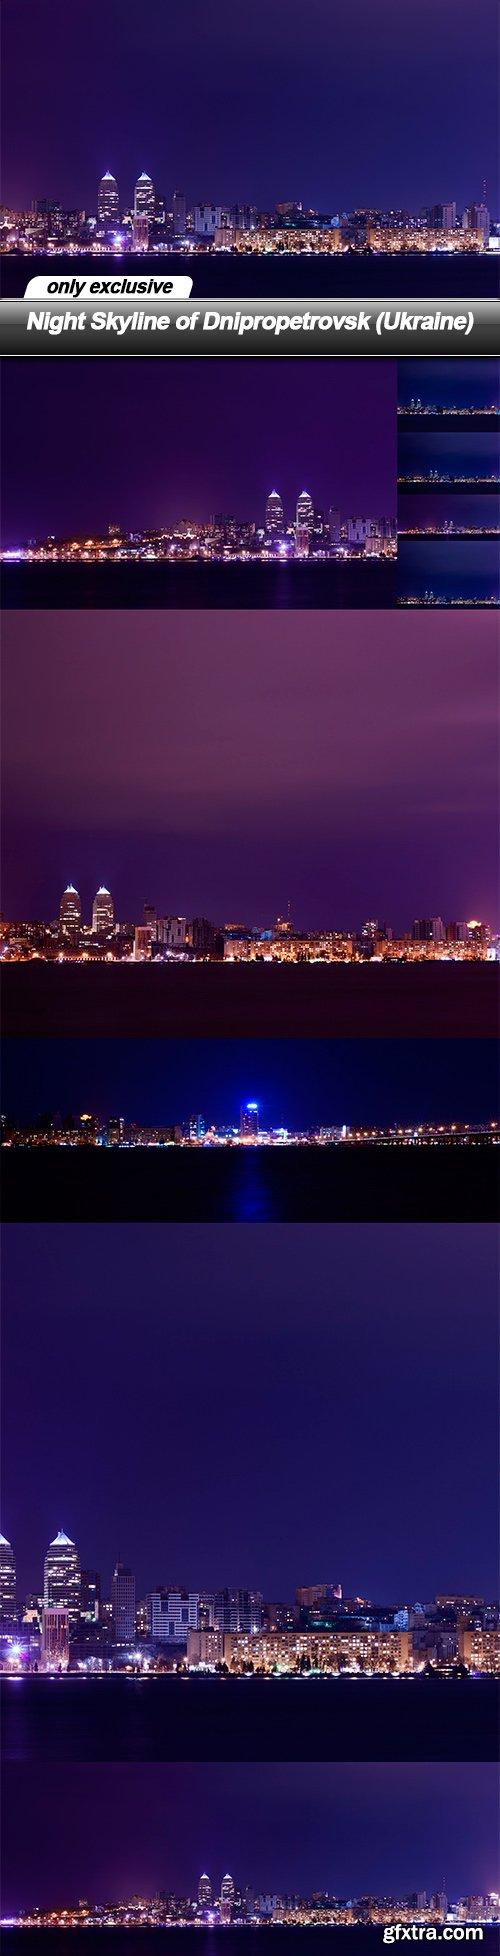 Night Skyline of Dnipropetrovsk (Ukraine) -  9 UHQ JPEG